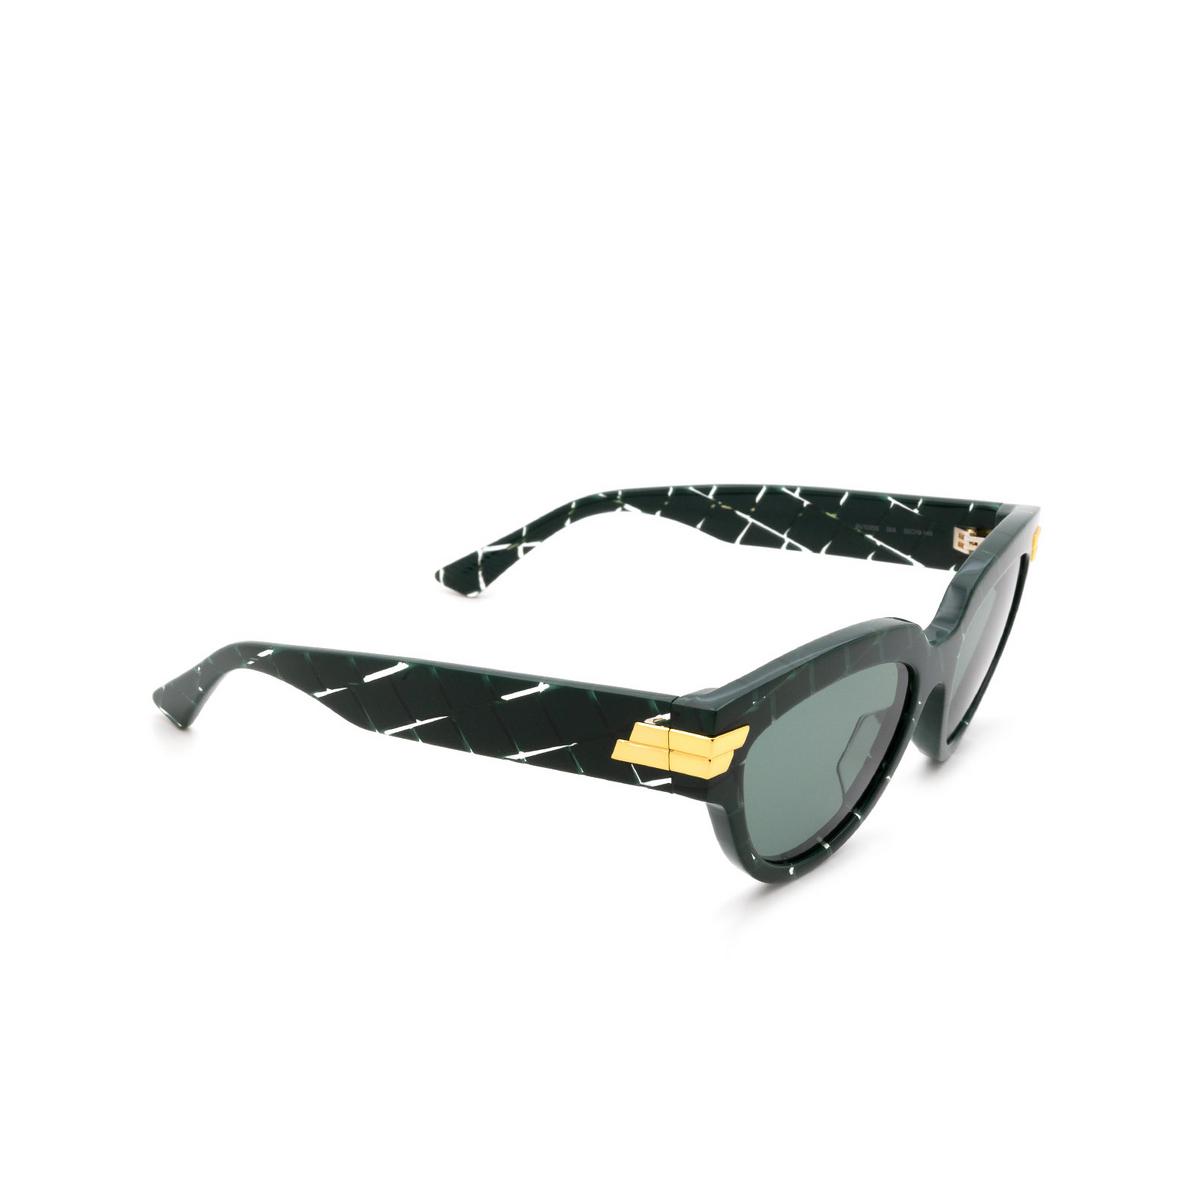 Bottega Veneta® Cat-eye Sunglasses: BV1035S color Green 004 - 2/3.